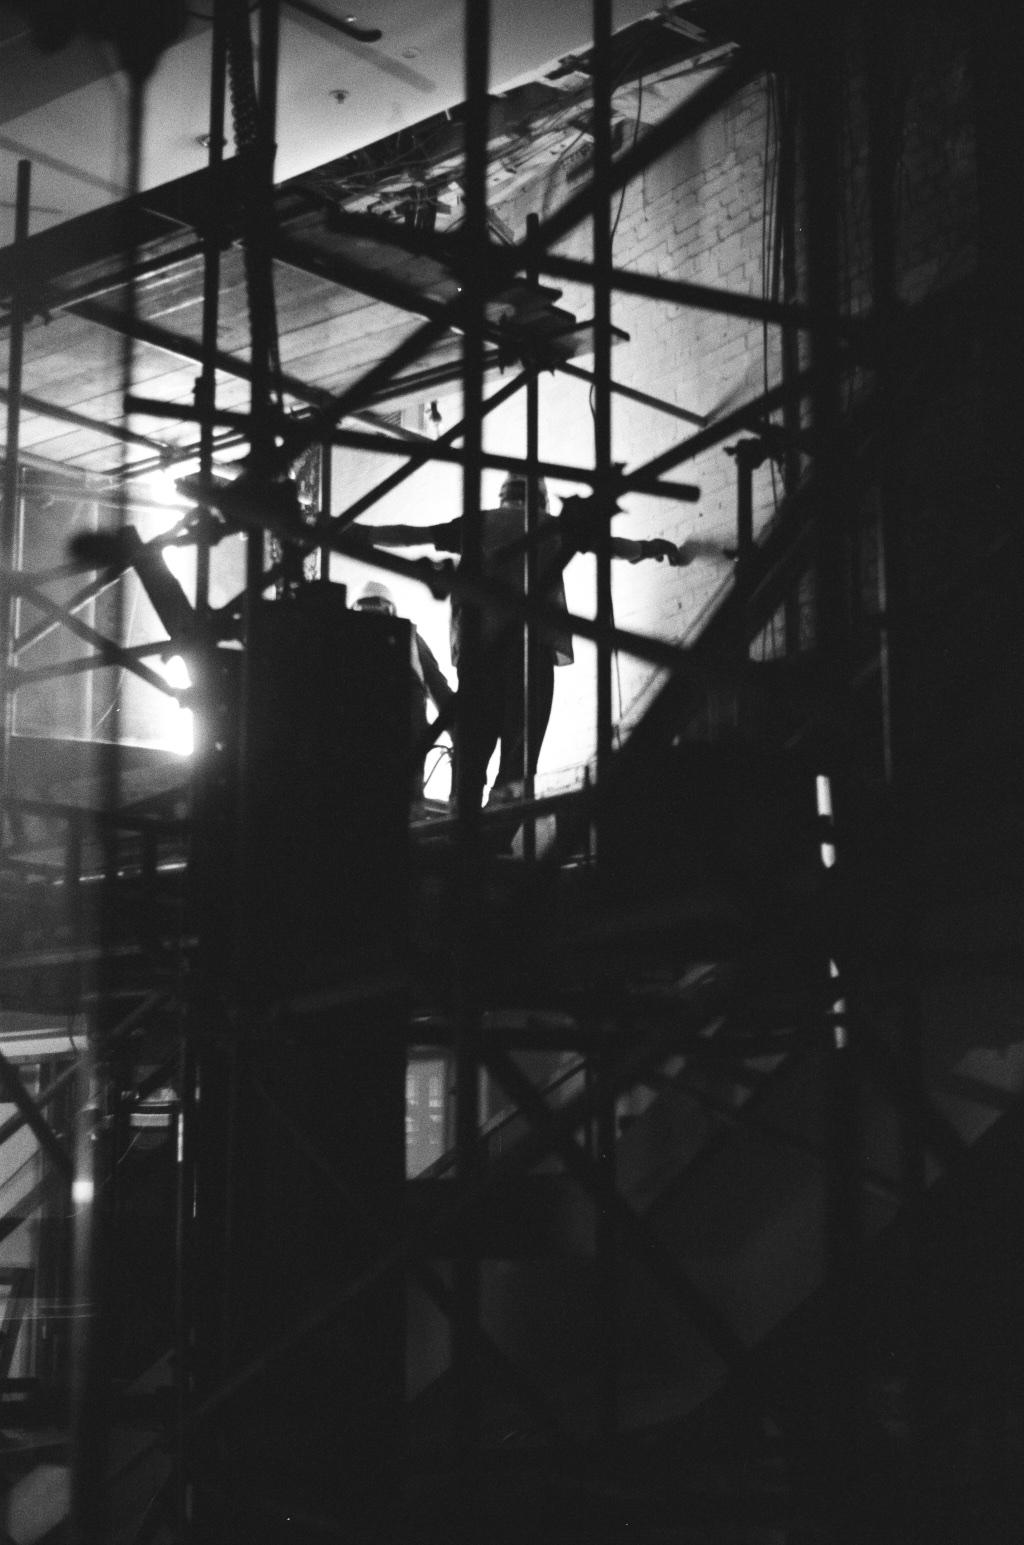 022_ConstructionCross.jpg